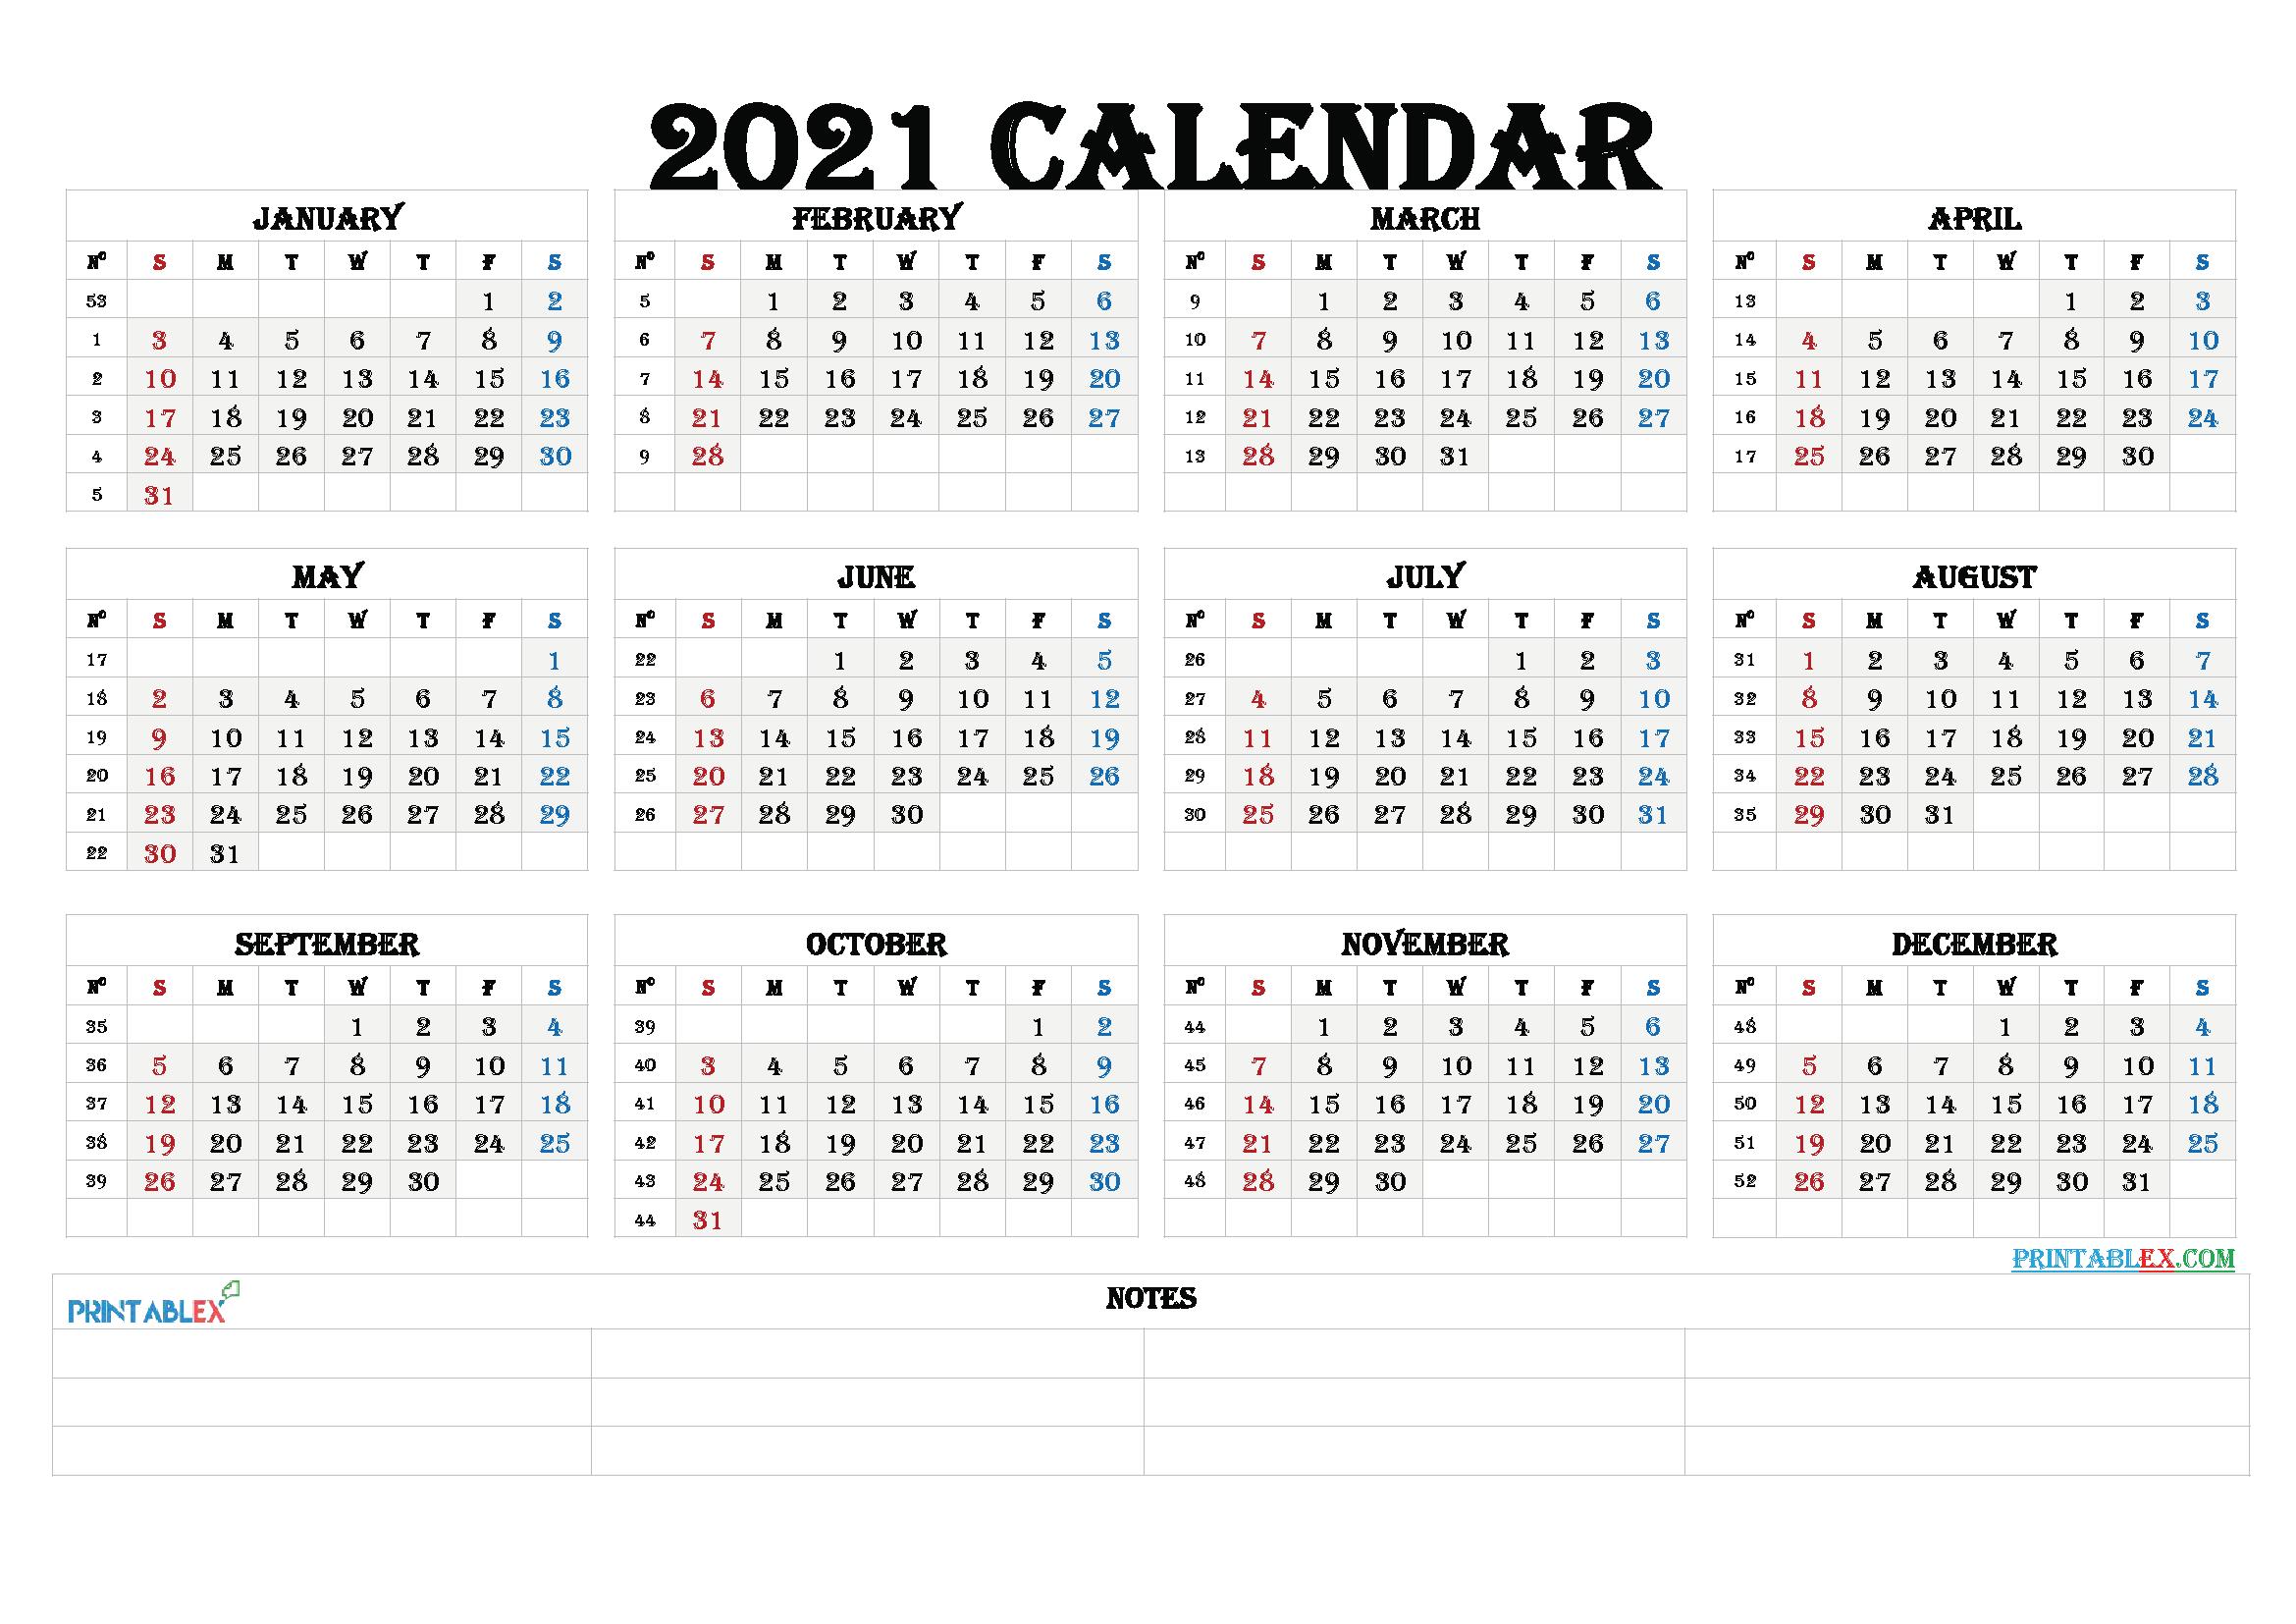 Printable Calendar Templates 2021 Free Printable 2020